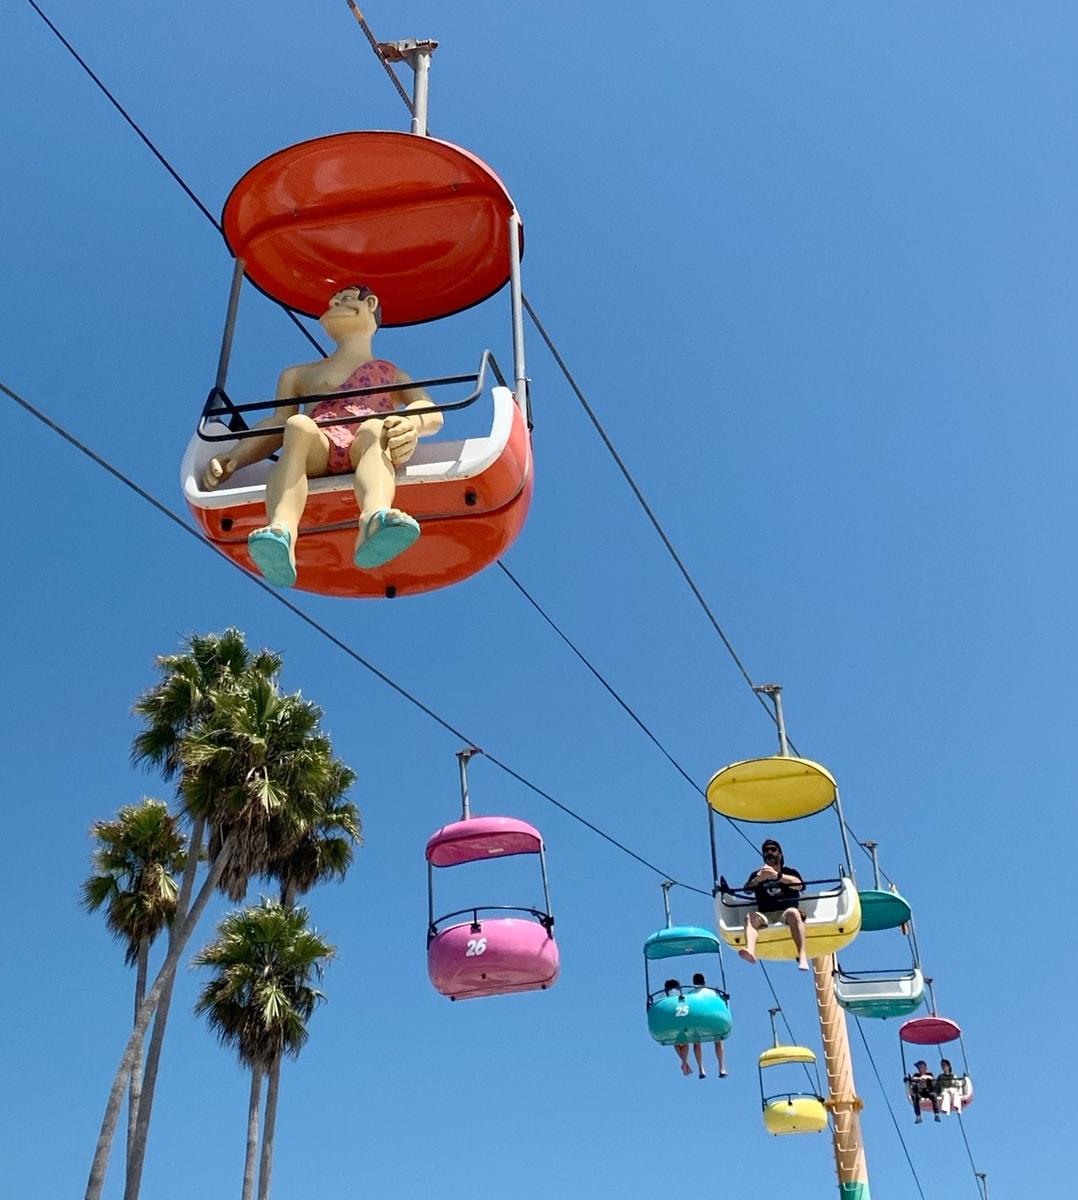 Sky ride at Santa Cruz Boardwalk